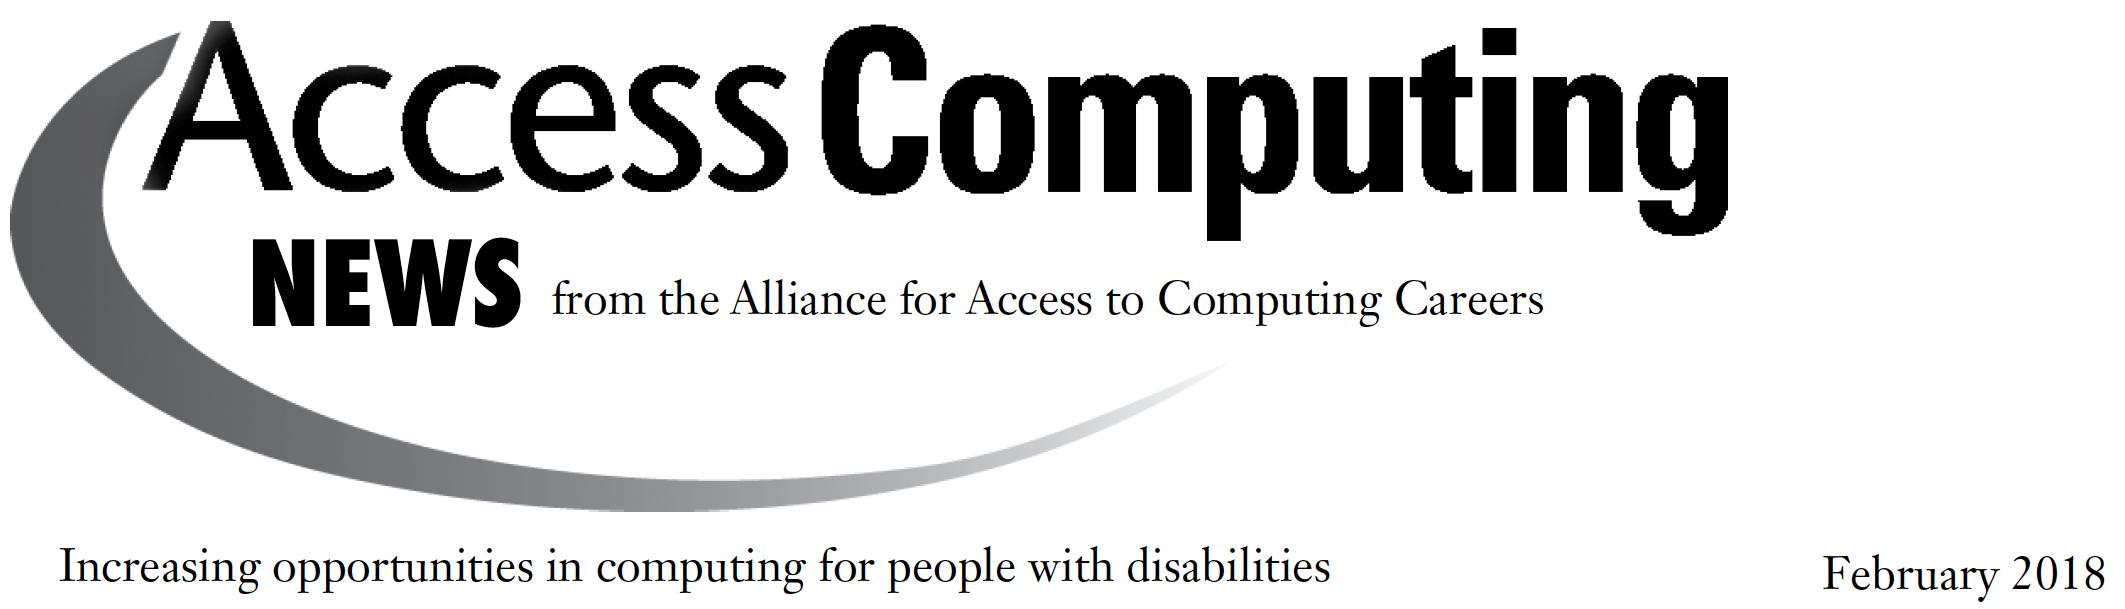 AccessComputing News Feb 2018 Header.